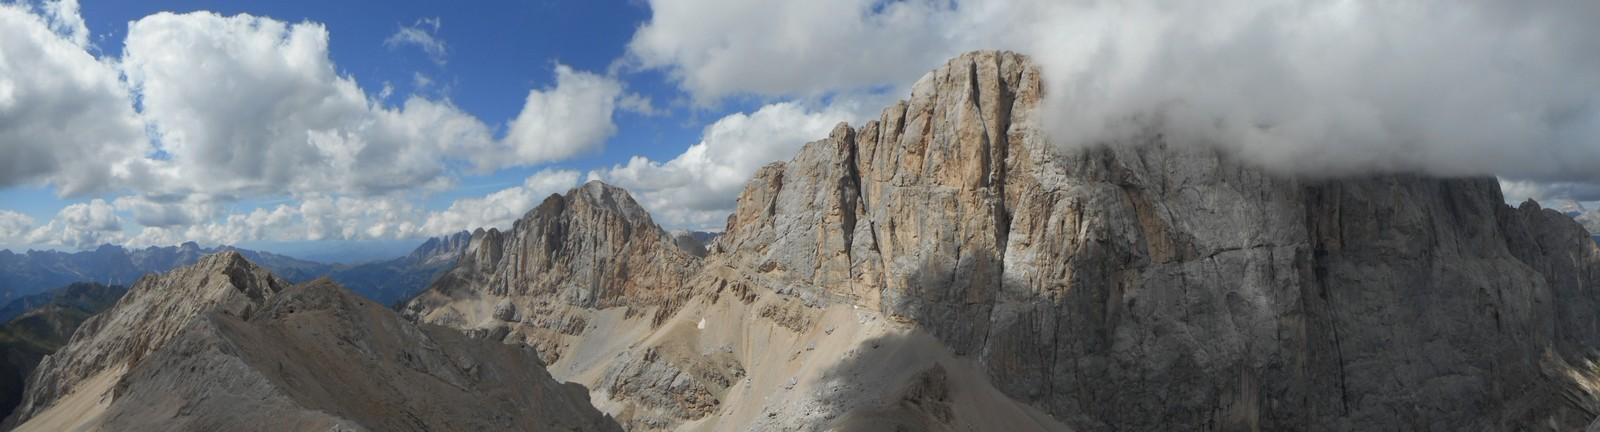 La face Sud de la Marmolada (3343m) depuis le pic d'Ombretta (3040m)